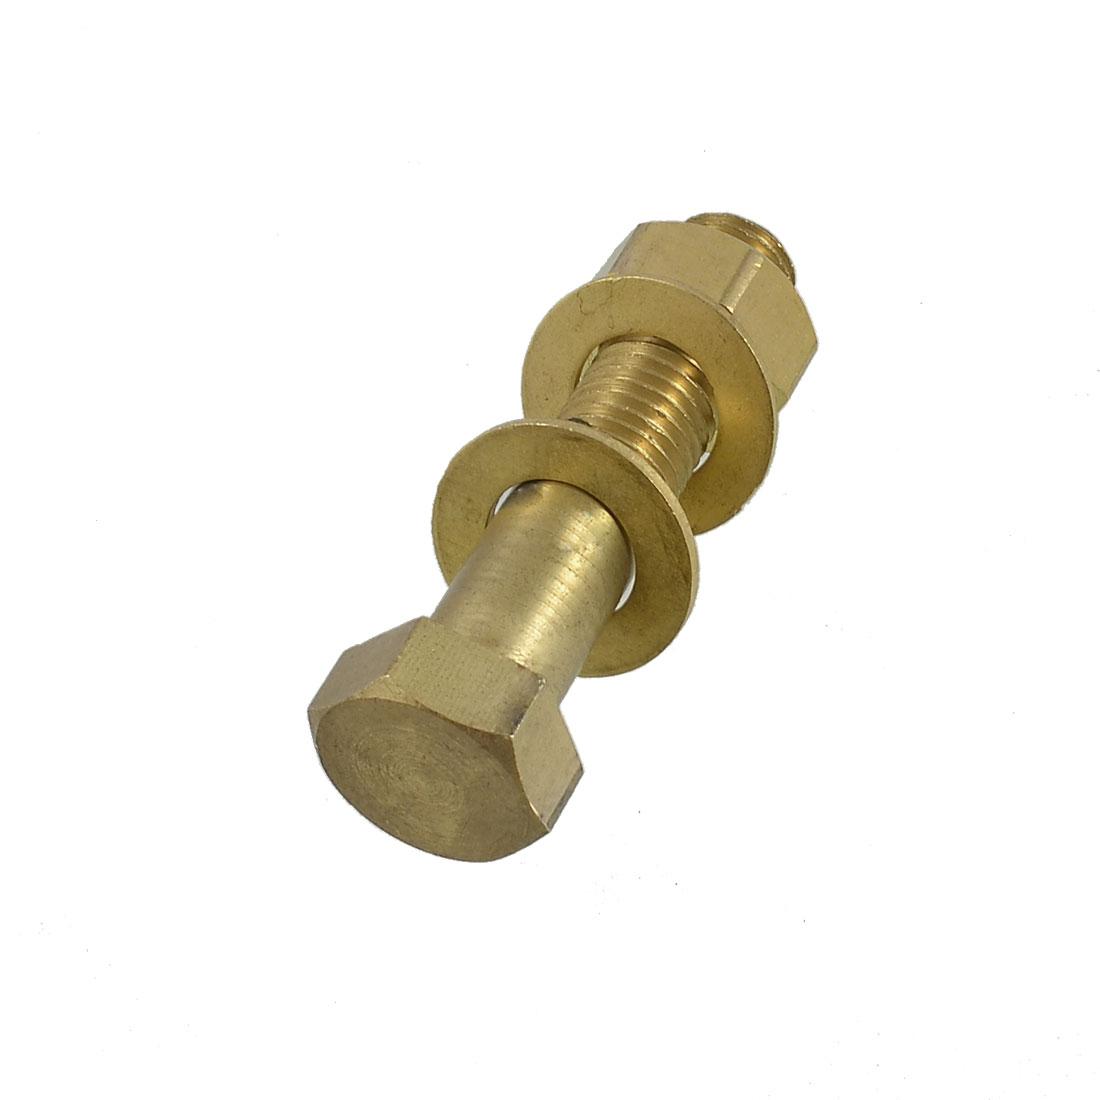 Gold Tone Brass Hex Screw Fastener 16mm x 70mm w 2 Gaskets Nut